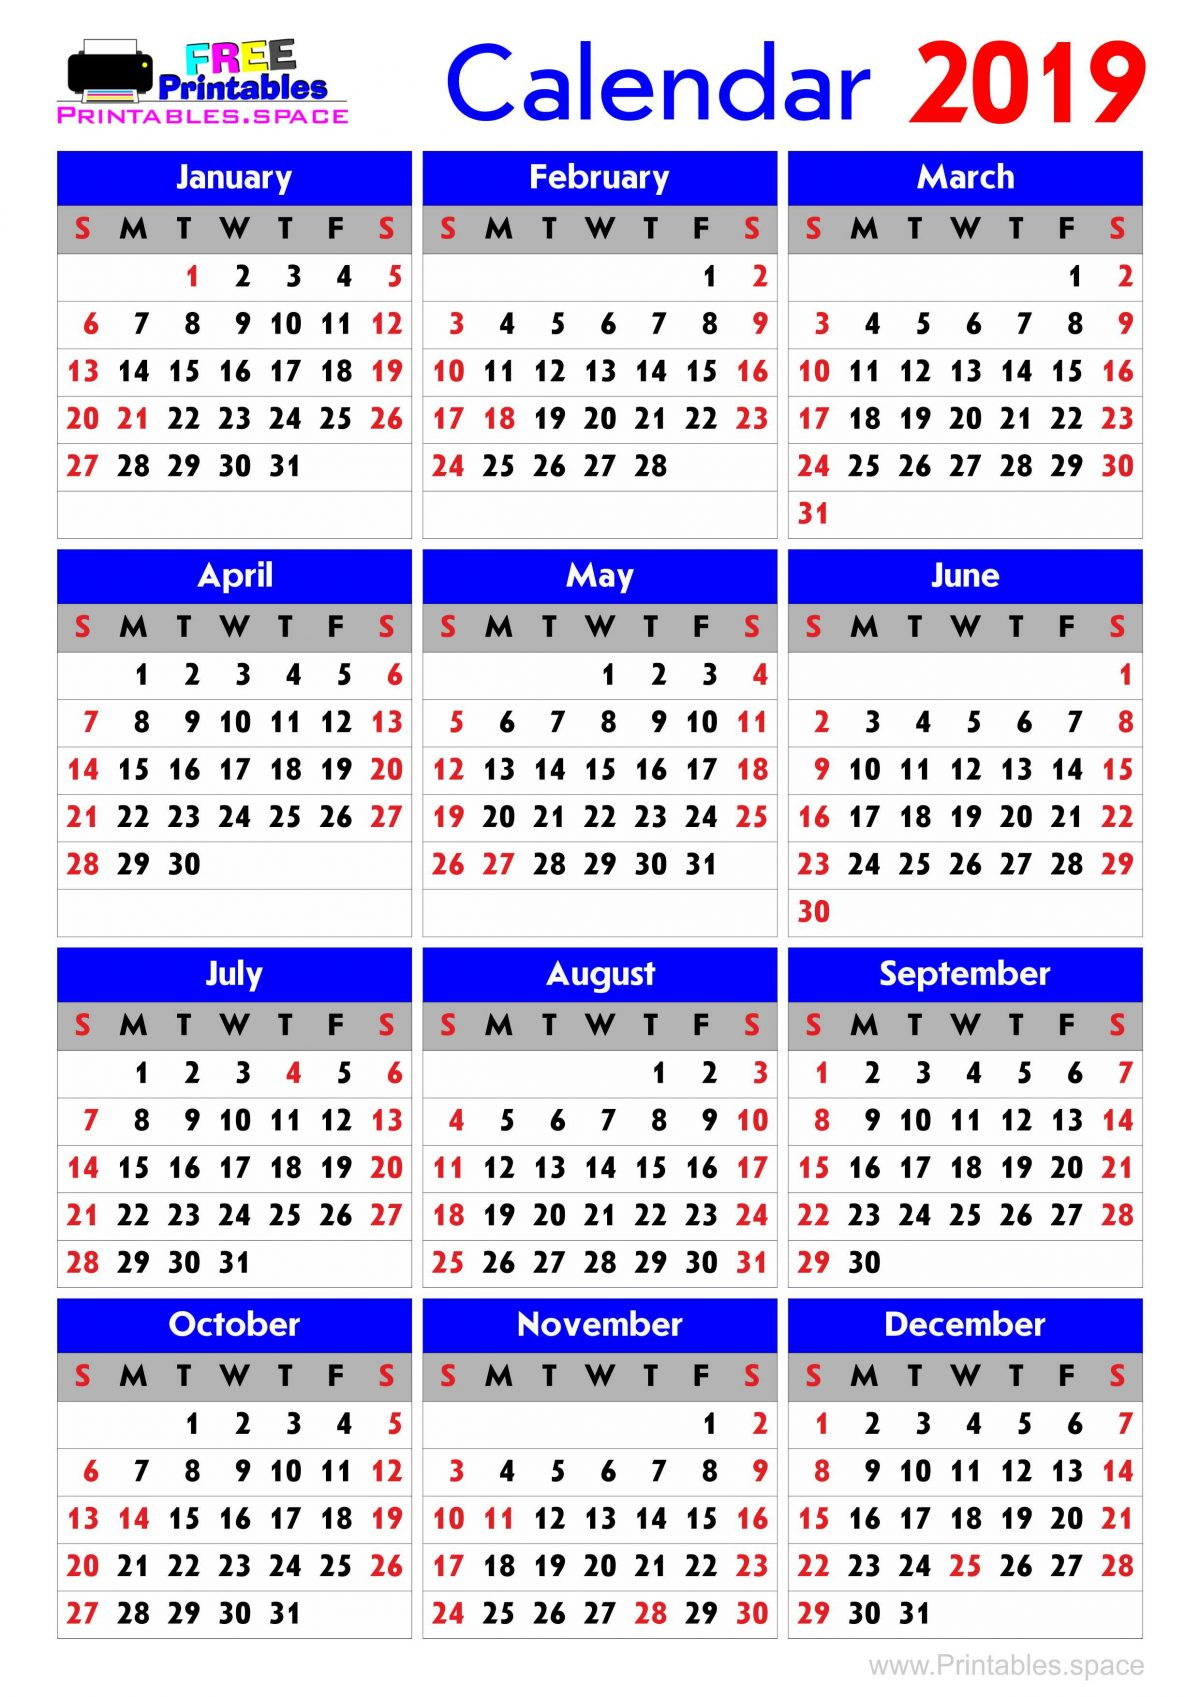 Year 2019 Calendar